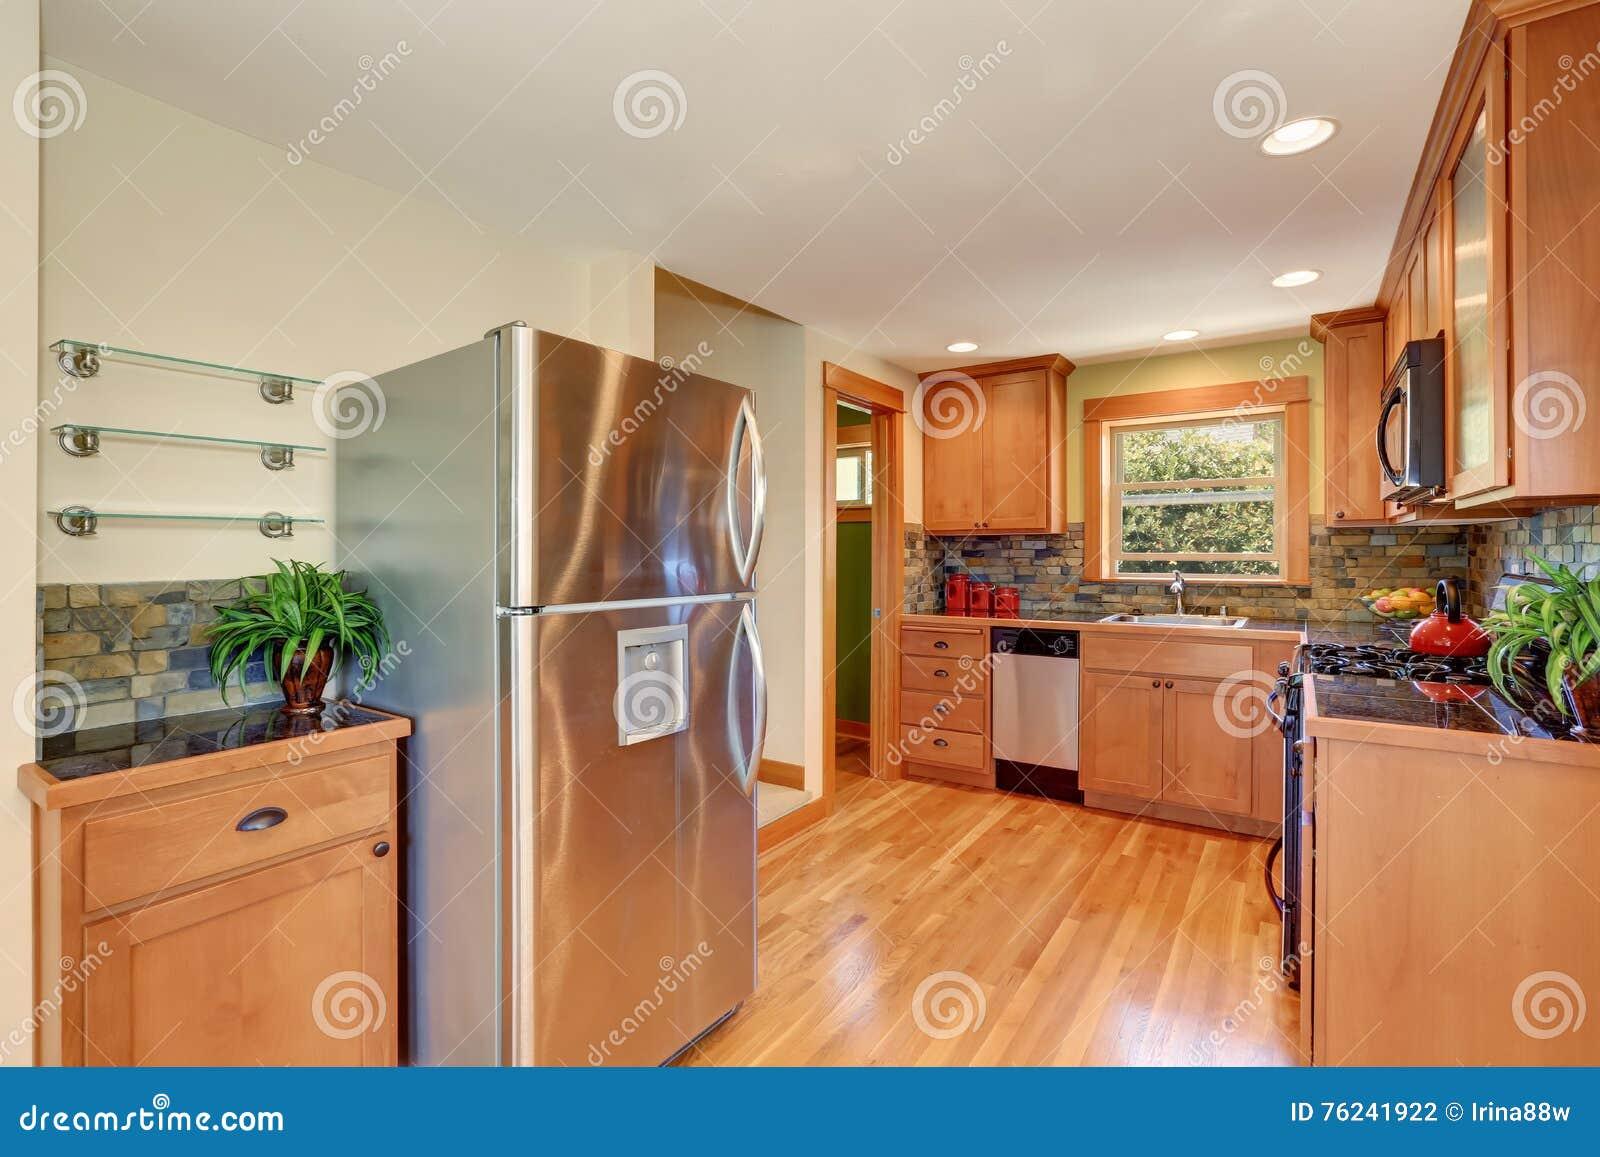 Light Brown Kitchen Cabinetry And Brick Tile Back Splash Trim Stock Photo Image Of Flat Steel 76241922